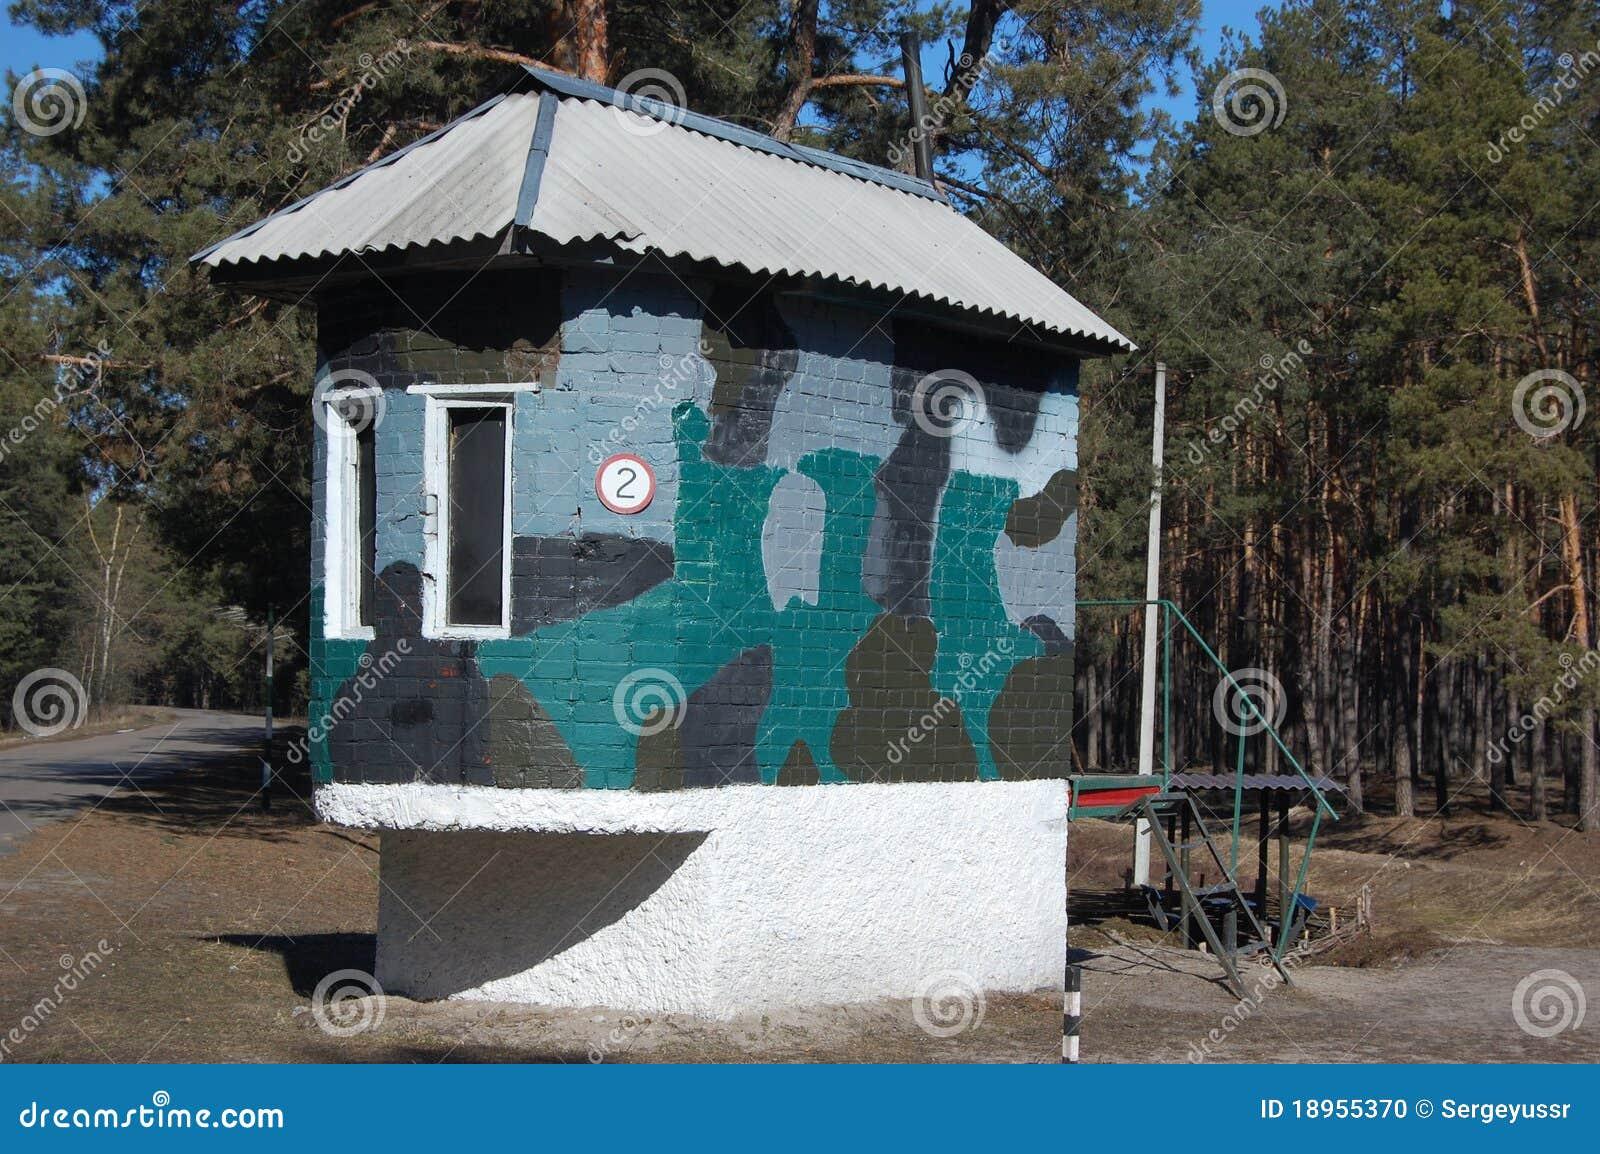 Abandoned military base checkpoint near Chernobyl alienation area